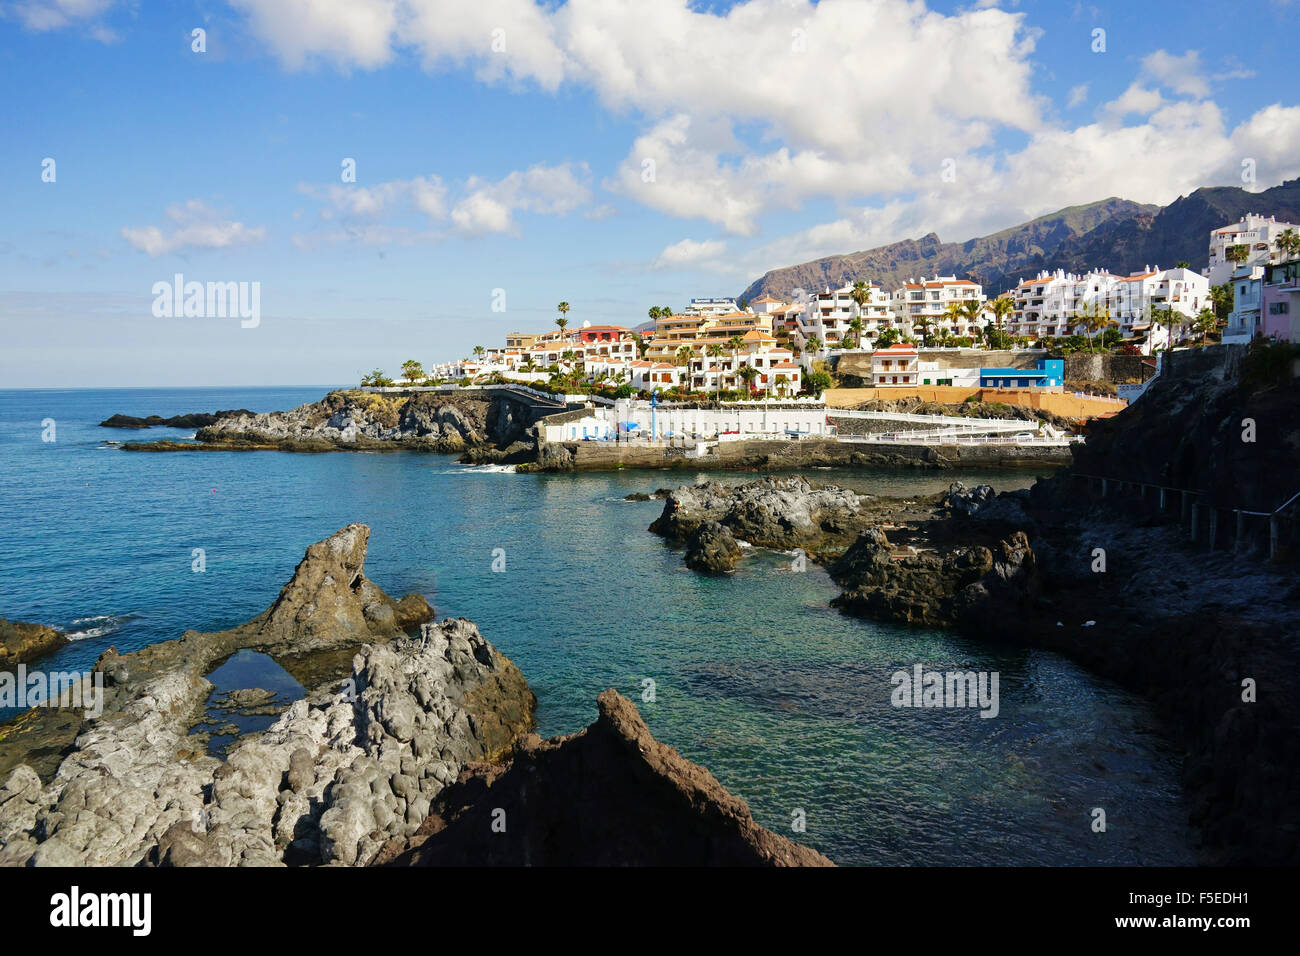 Puerto de Santiago, Teneriffa, Kanarische Inseln, Spanien, Atlantik, Europa Stockfoto